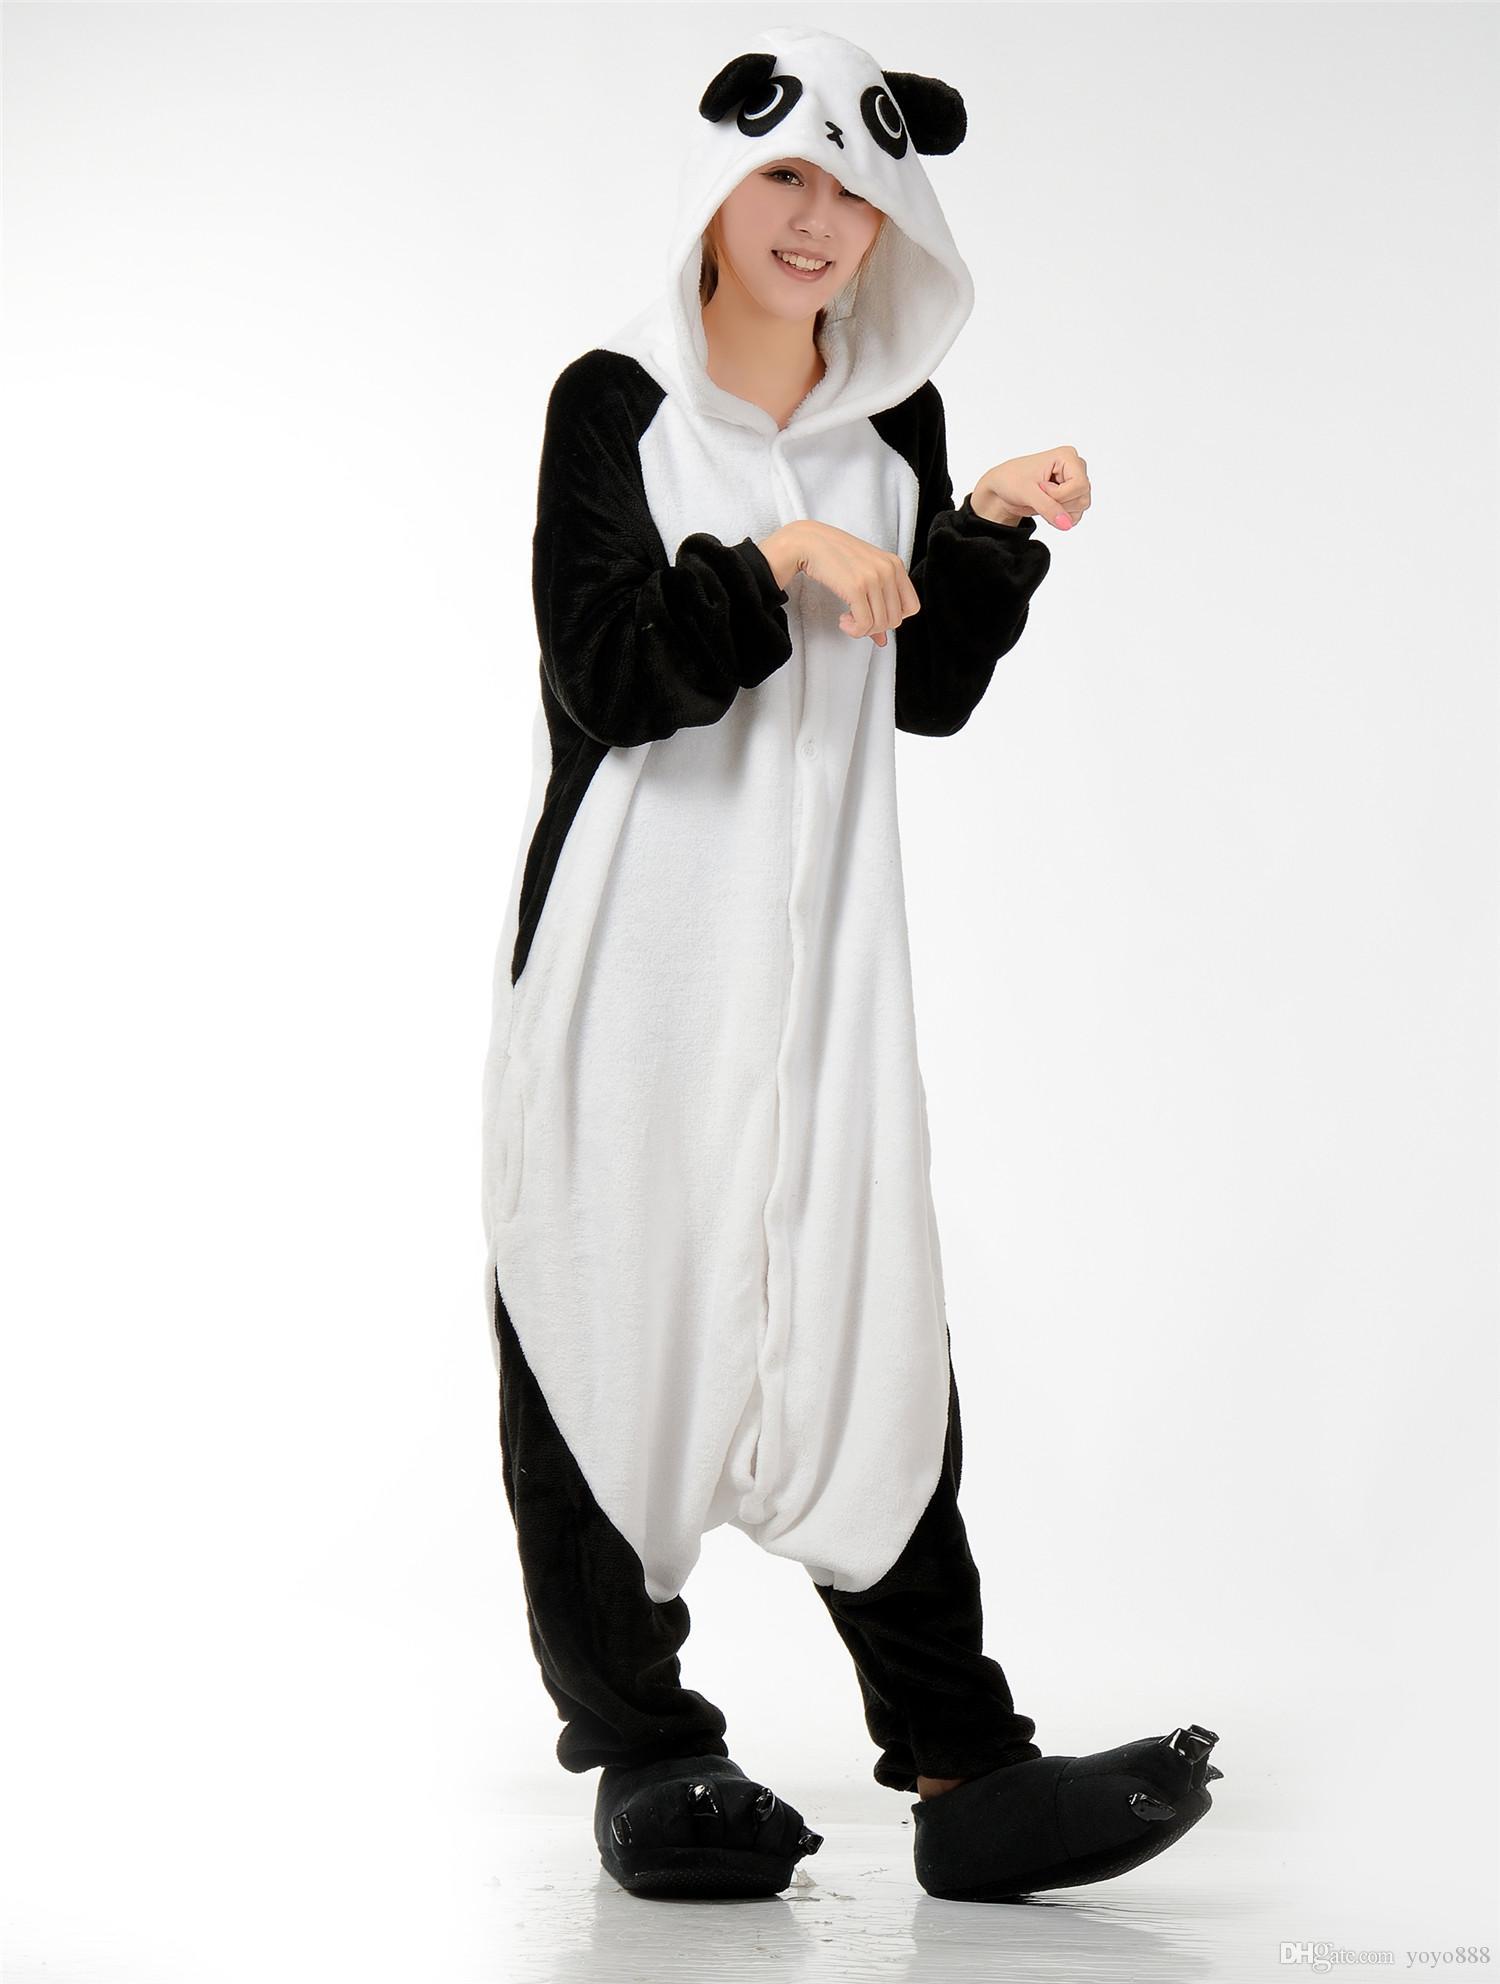 più foto bb7ee 5e710 Acquista Womens Mens Unisex Panda Tuta Onesie Pigiama Costumi Cosplay R366  S XL A $27.41 Dal Yoyo888   DHgate.Com